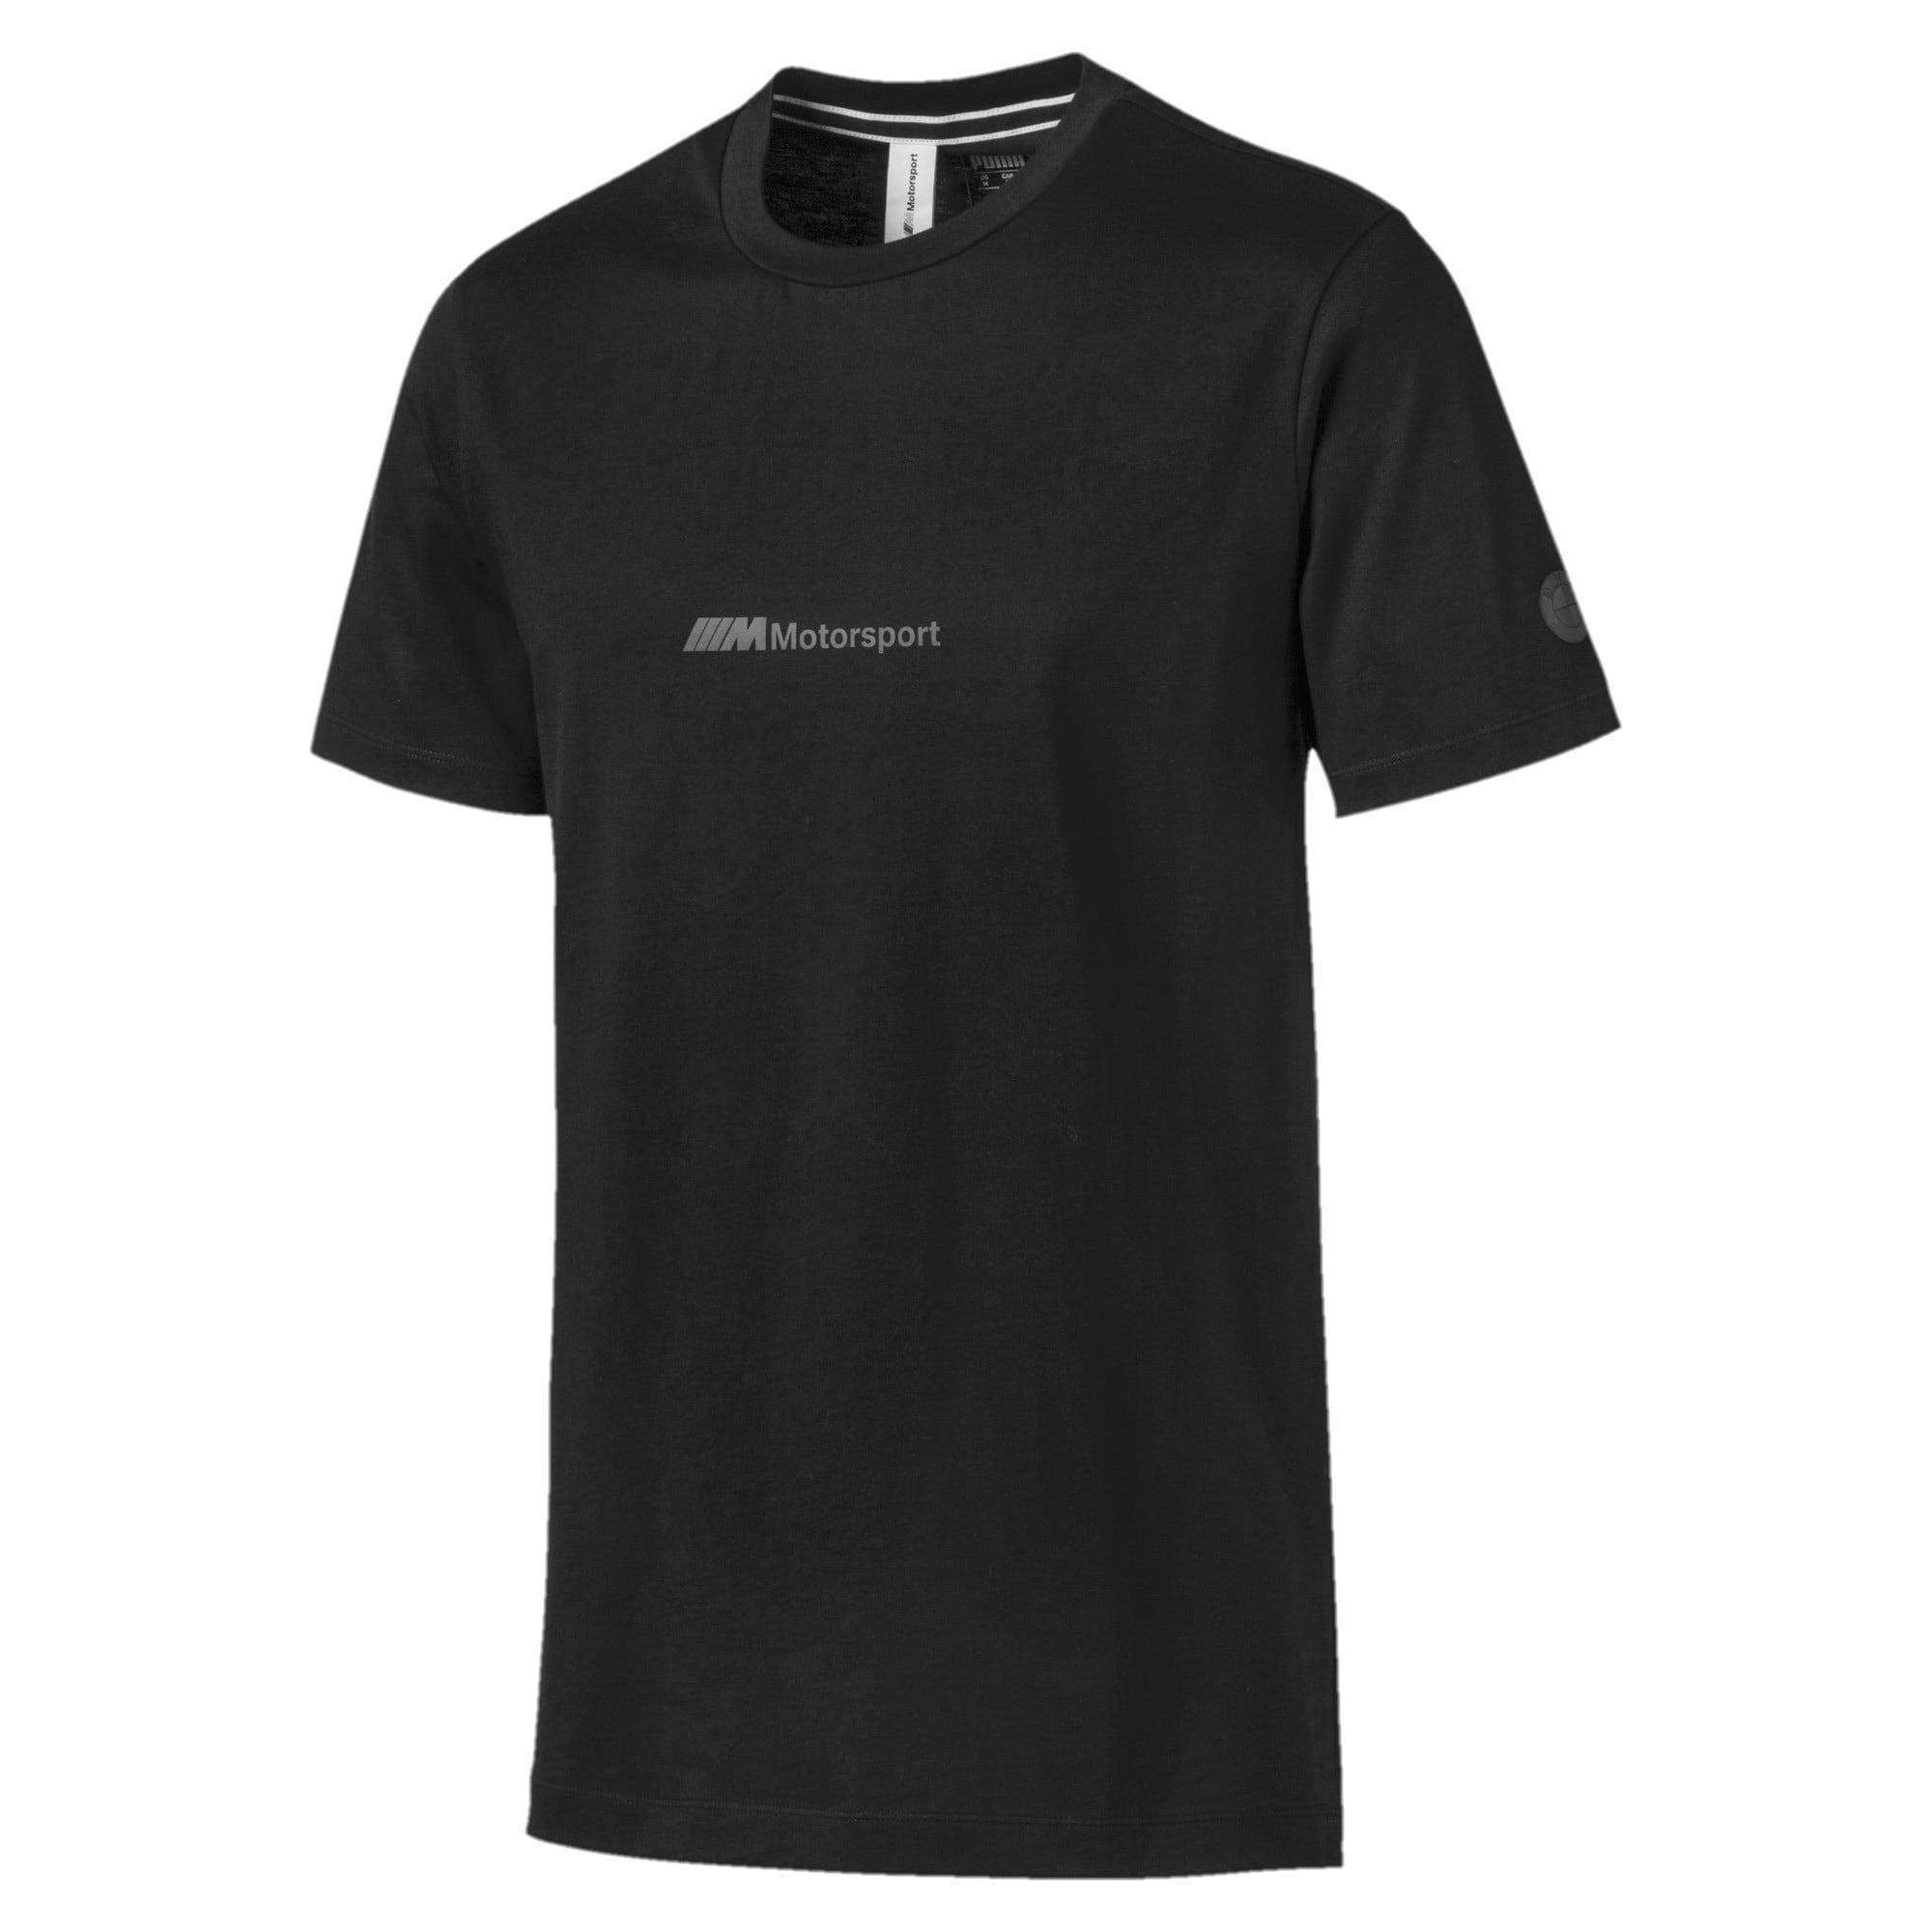 Thumbnail 4 of T-shirt BMW Motorsport Life uomo, Puma Black, medium